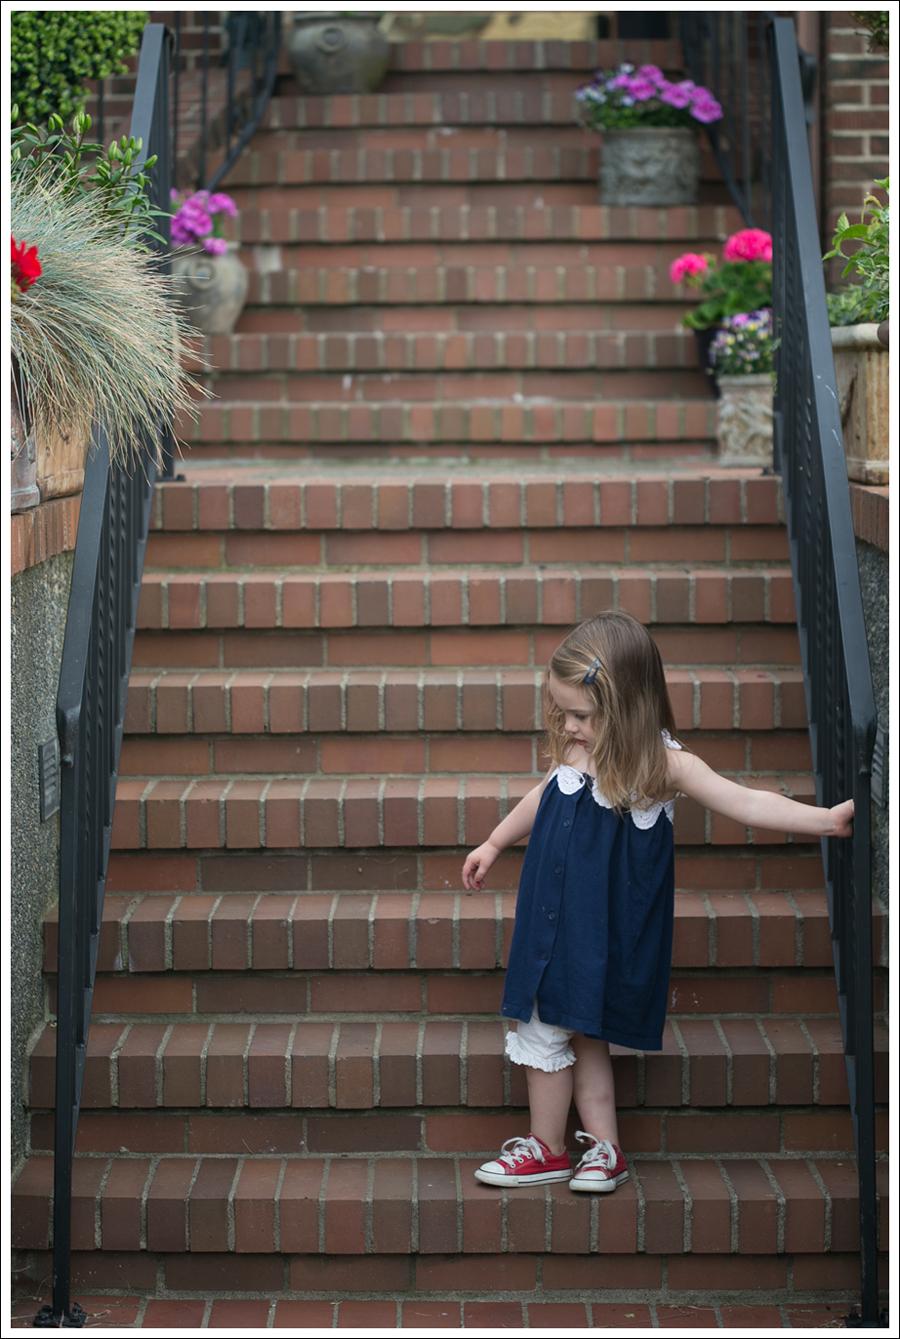 Blog Gap Dress B Nature Bloomers Red Converse-3